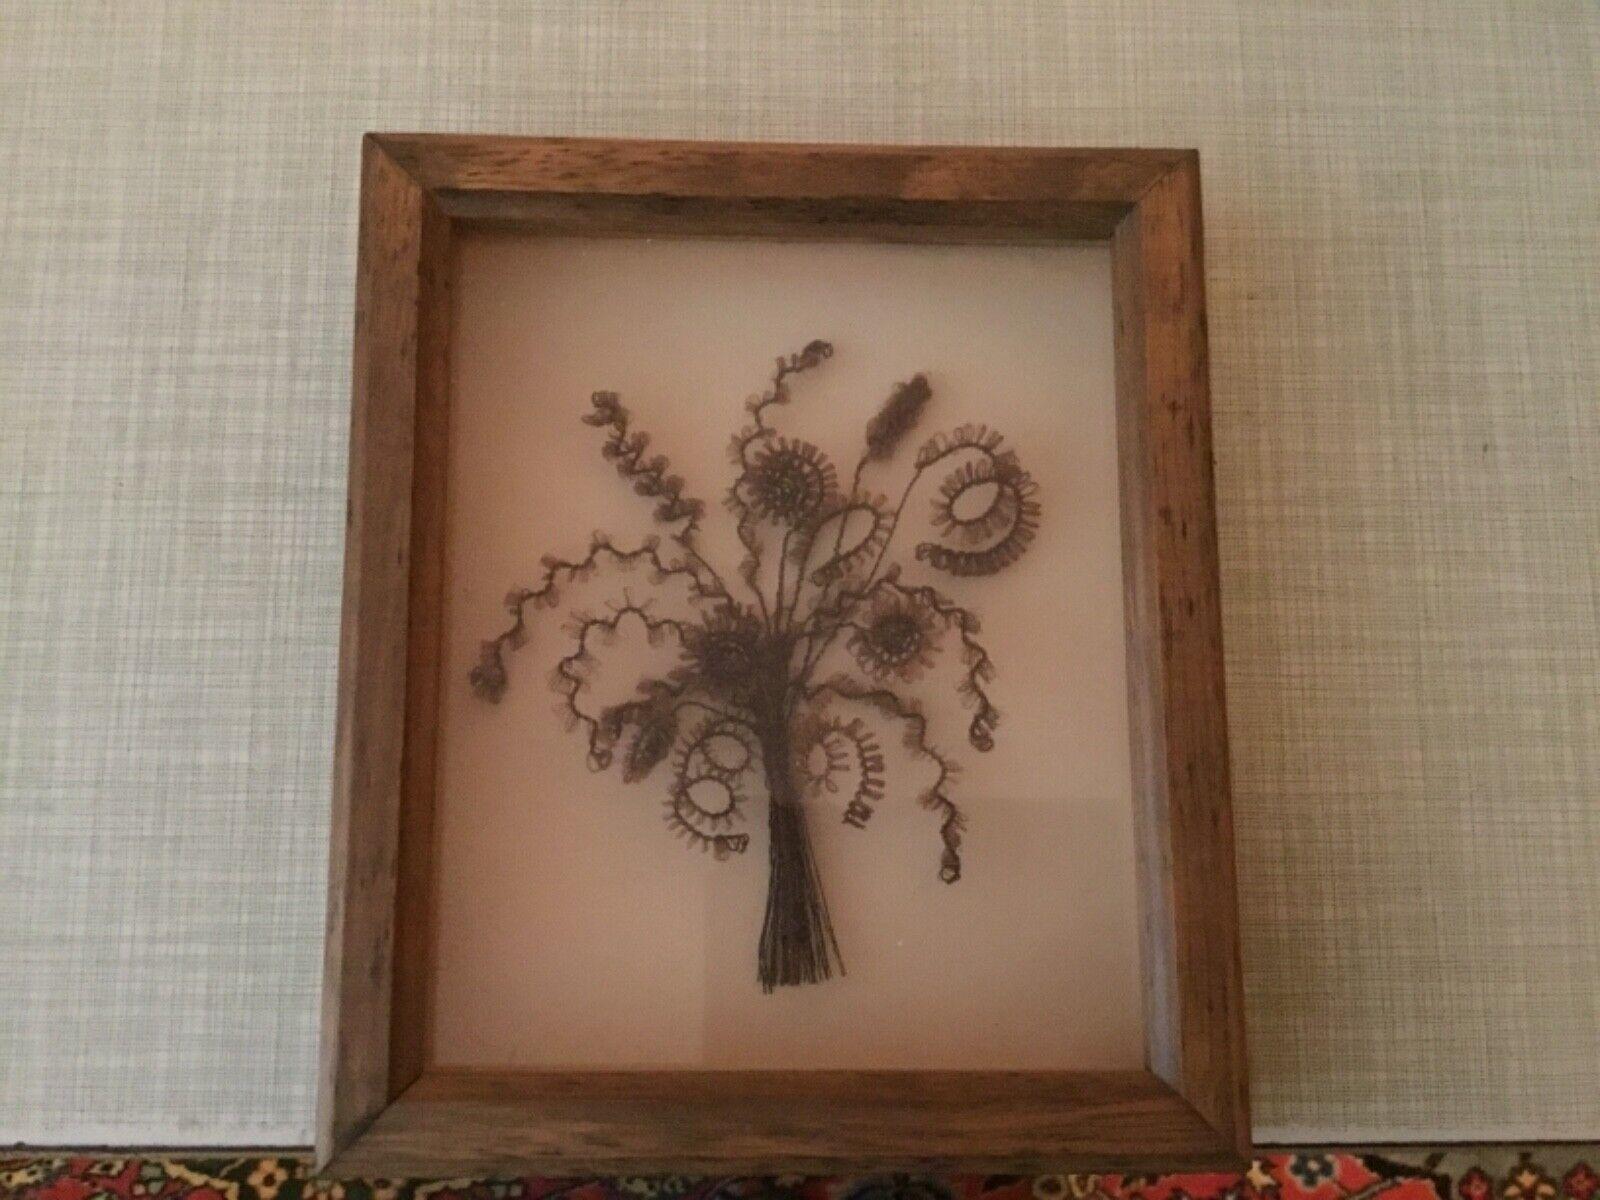 Haarbild Antik, Handarbeit hinter Glas, Biedermeier Stil